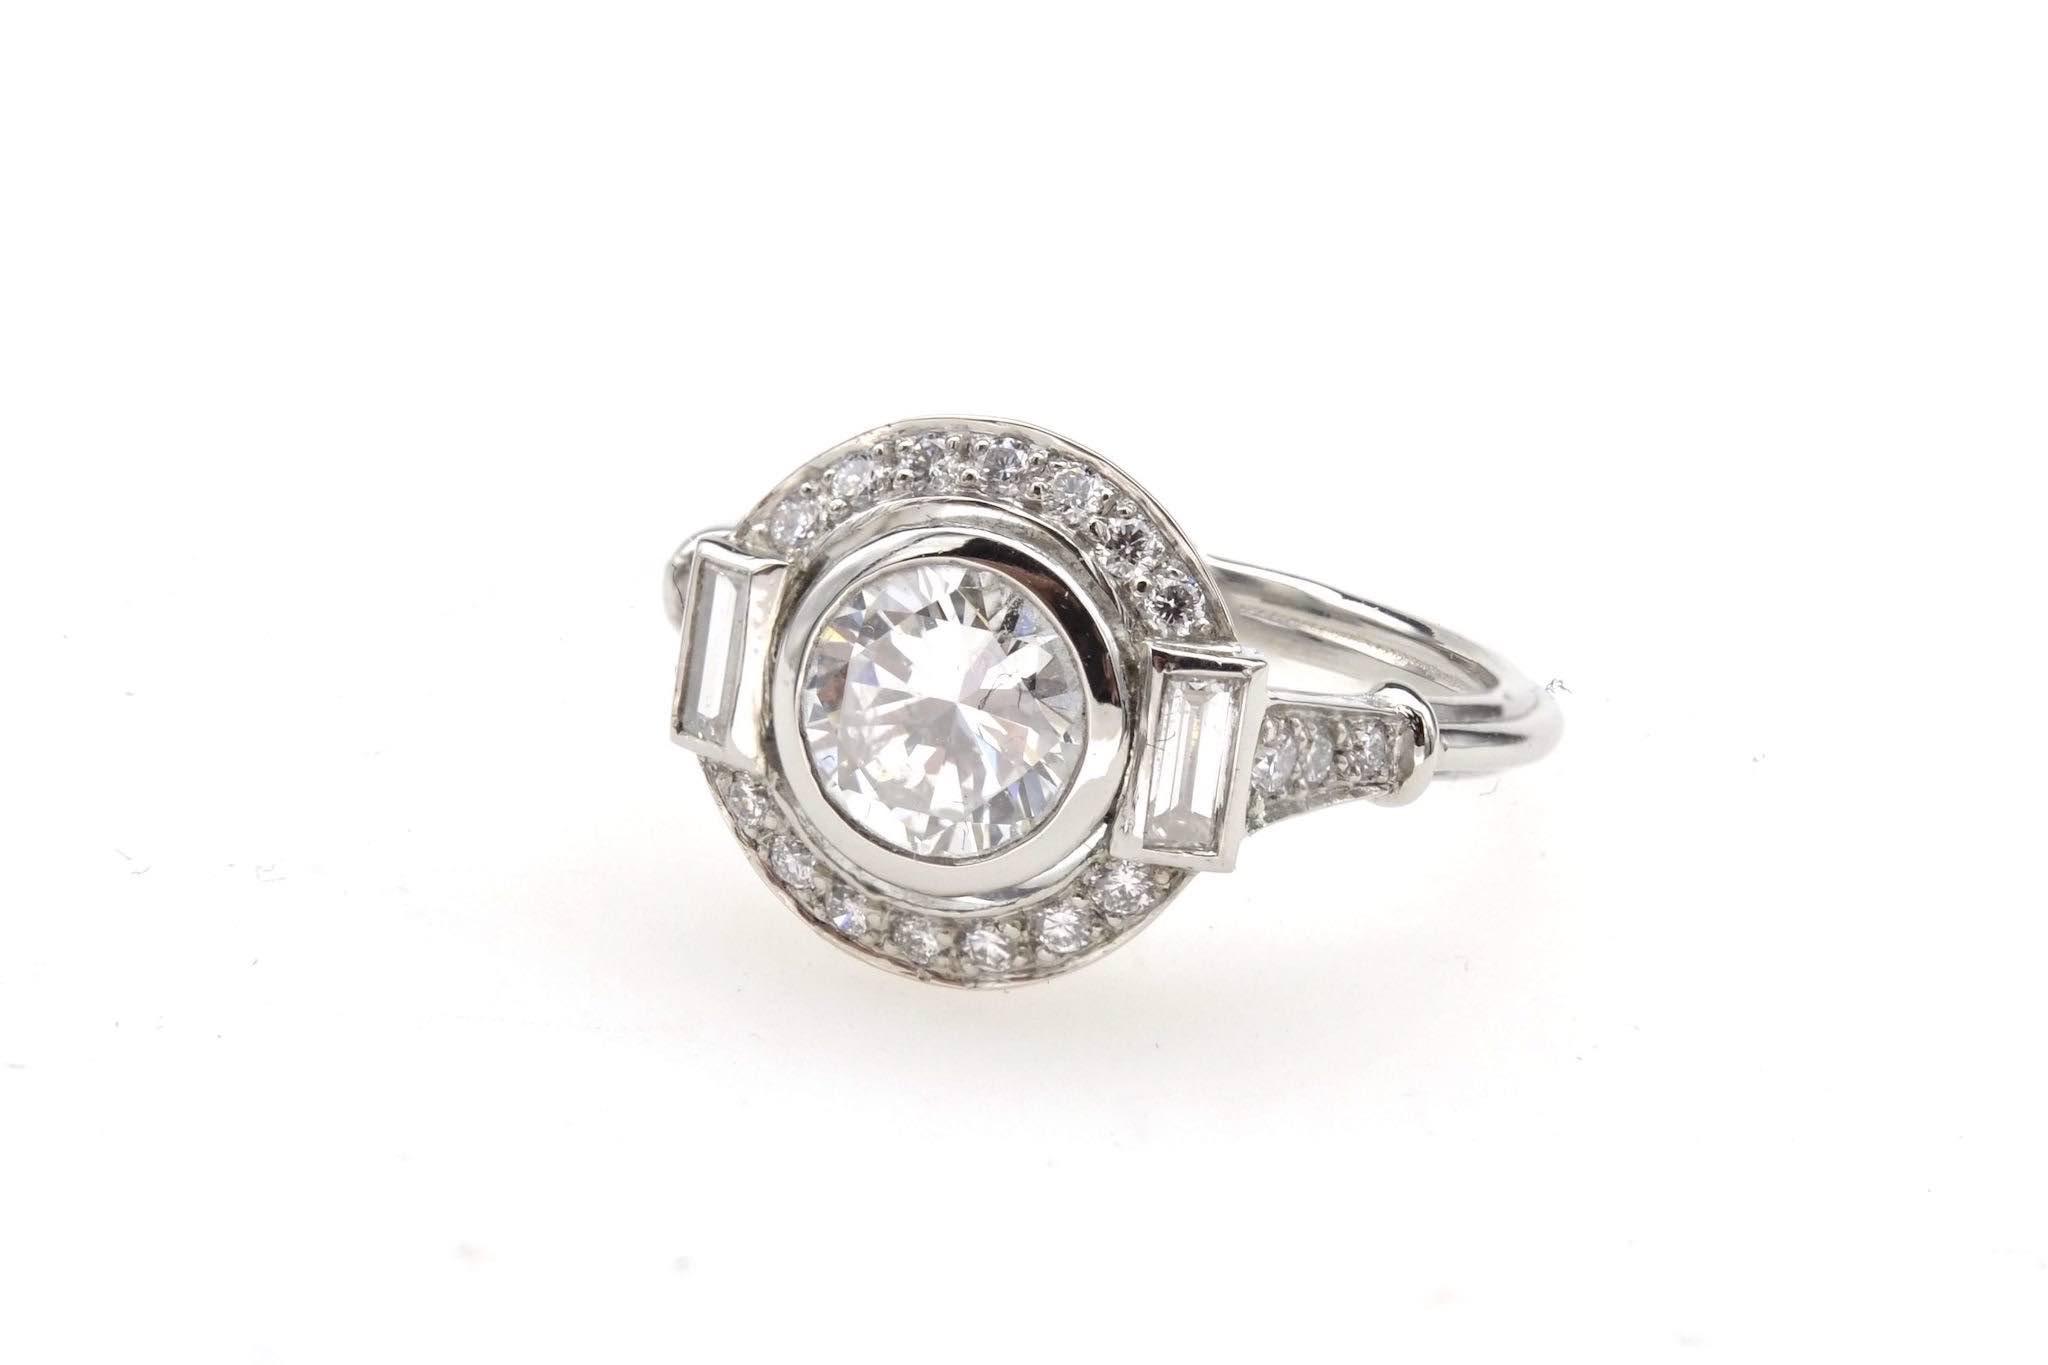 rachat diamant de taille brillant